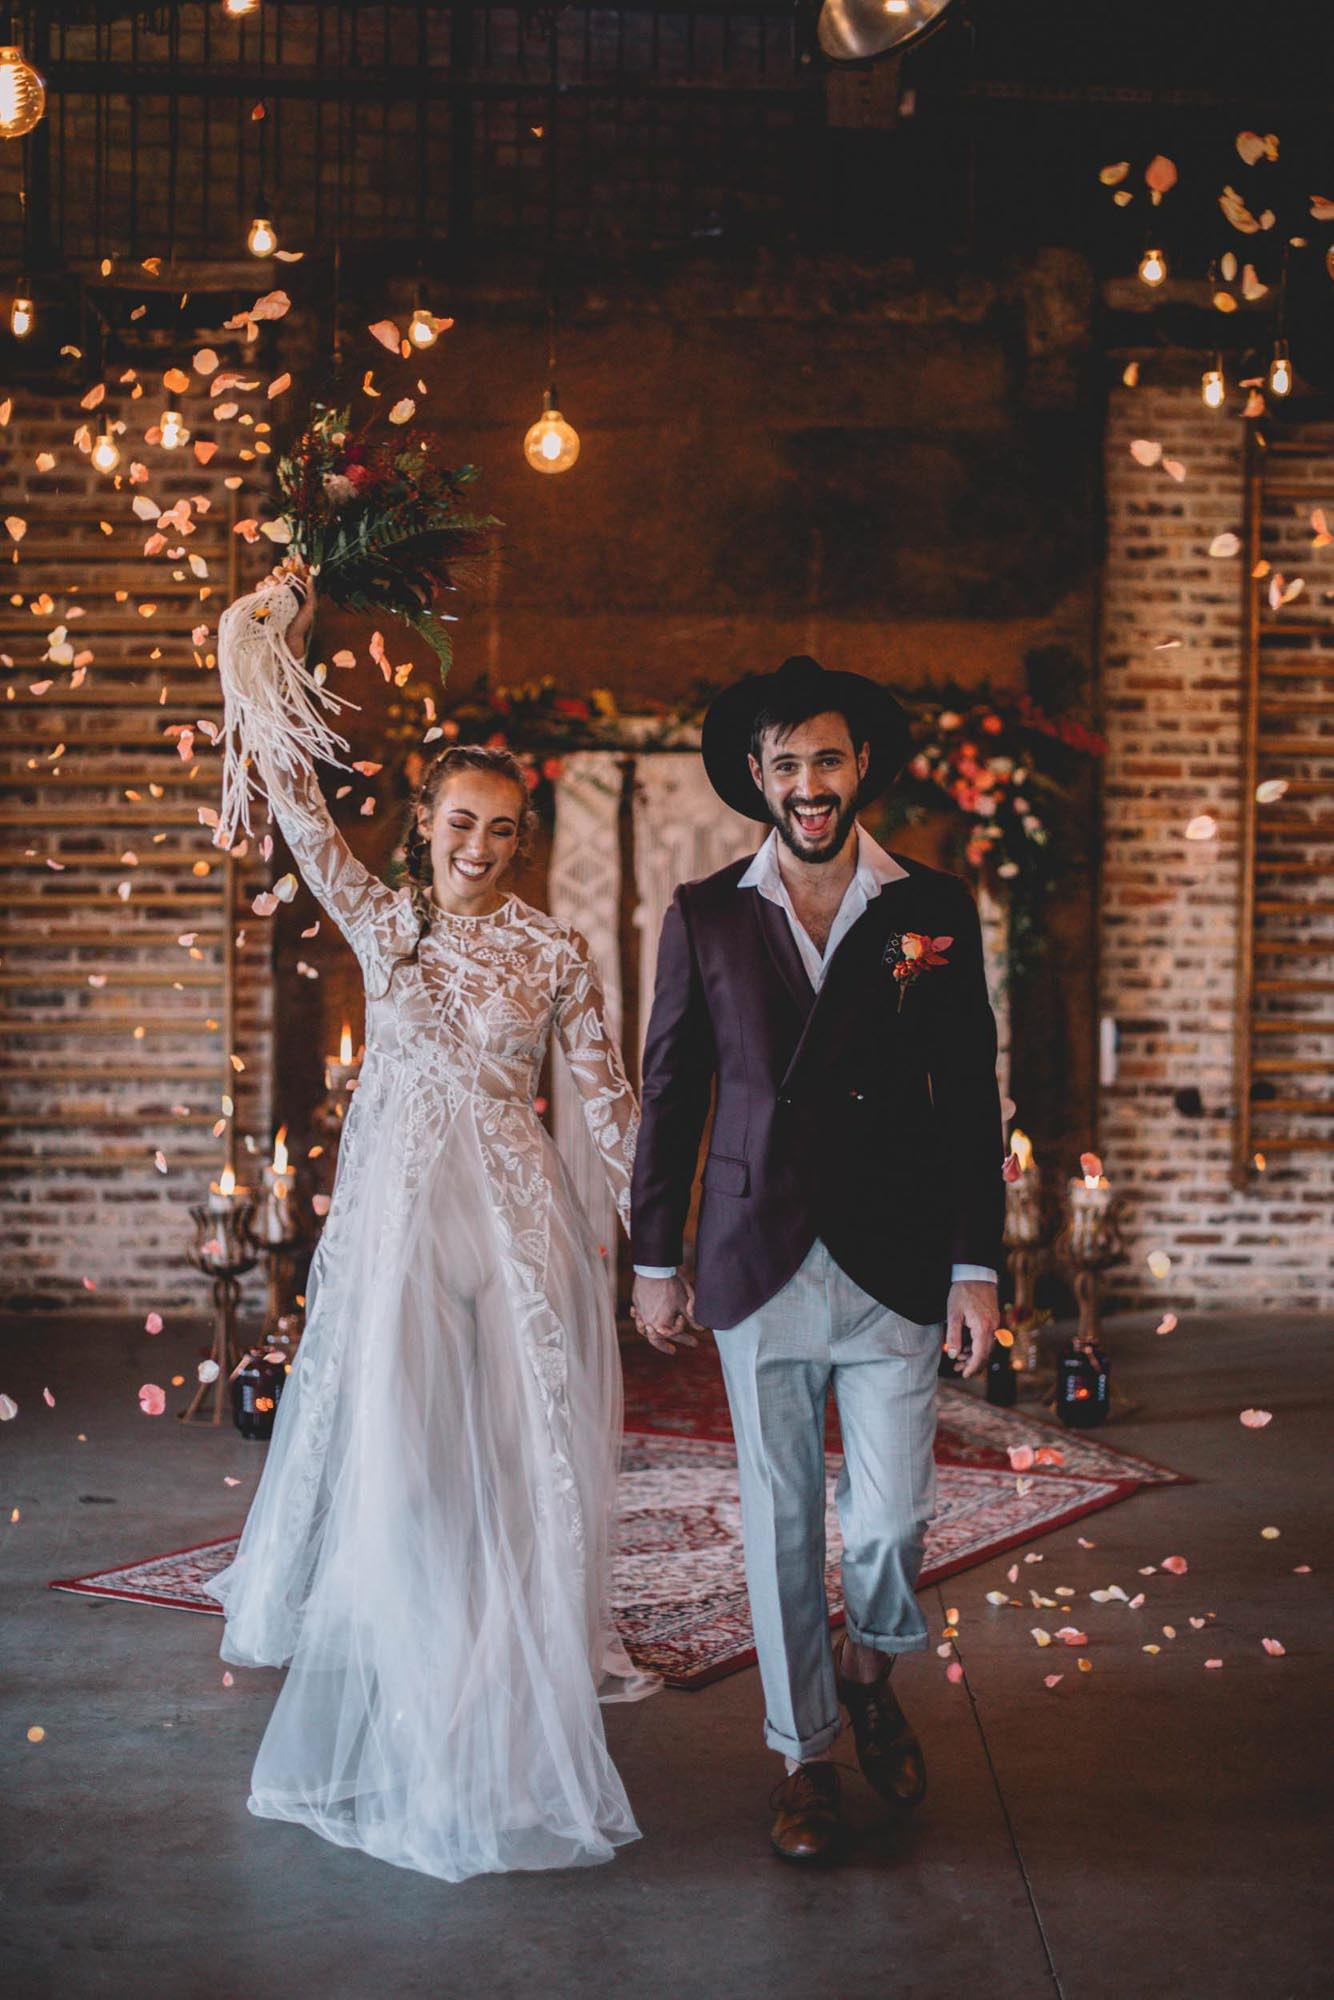 COACHELLA_LES BONNES JOIES_PHOTOGRAPHE_MARIAGE_LES BANDITS-2